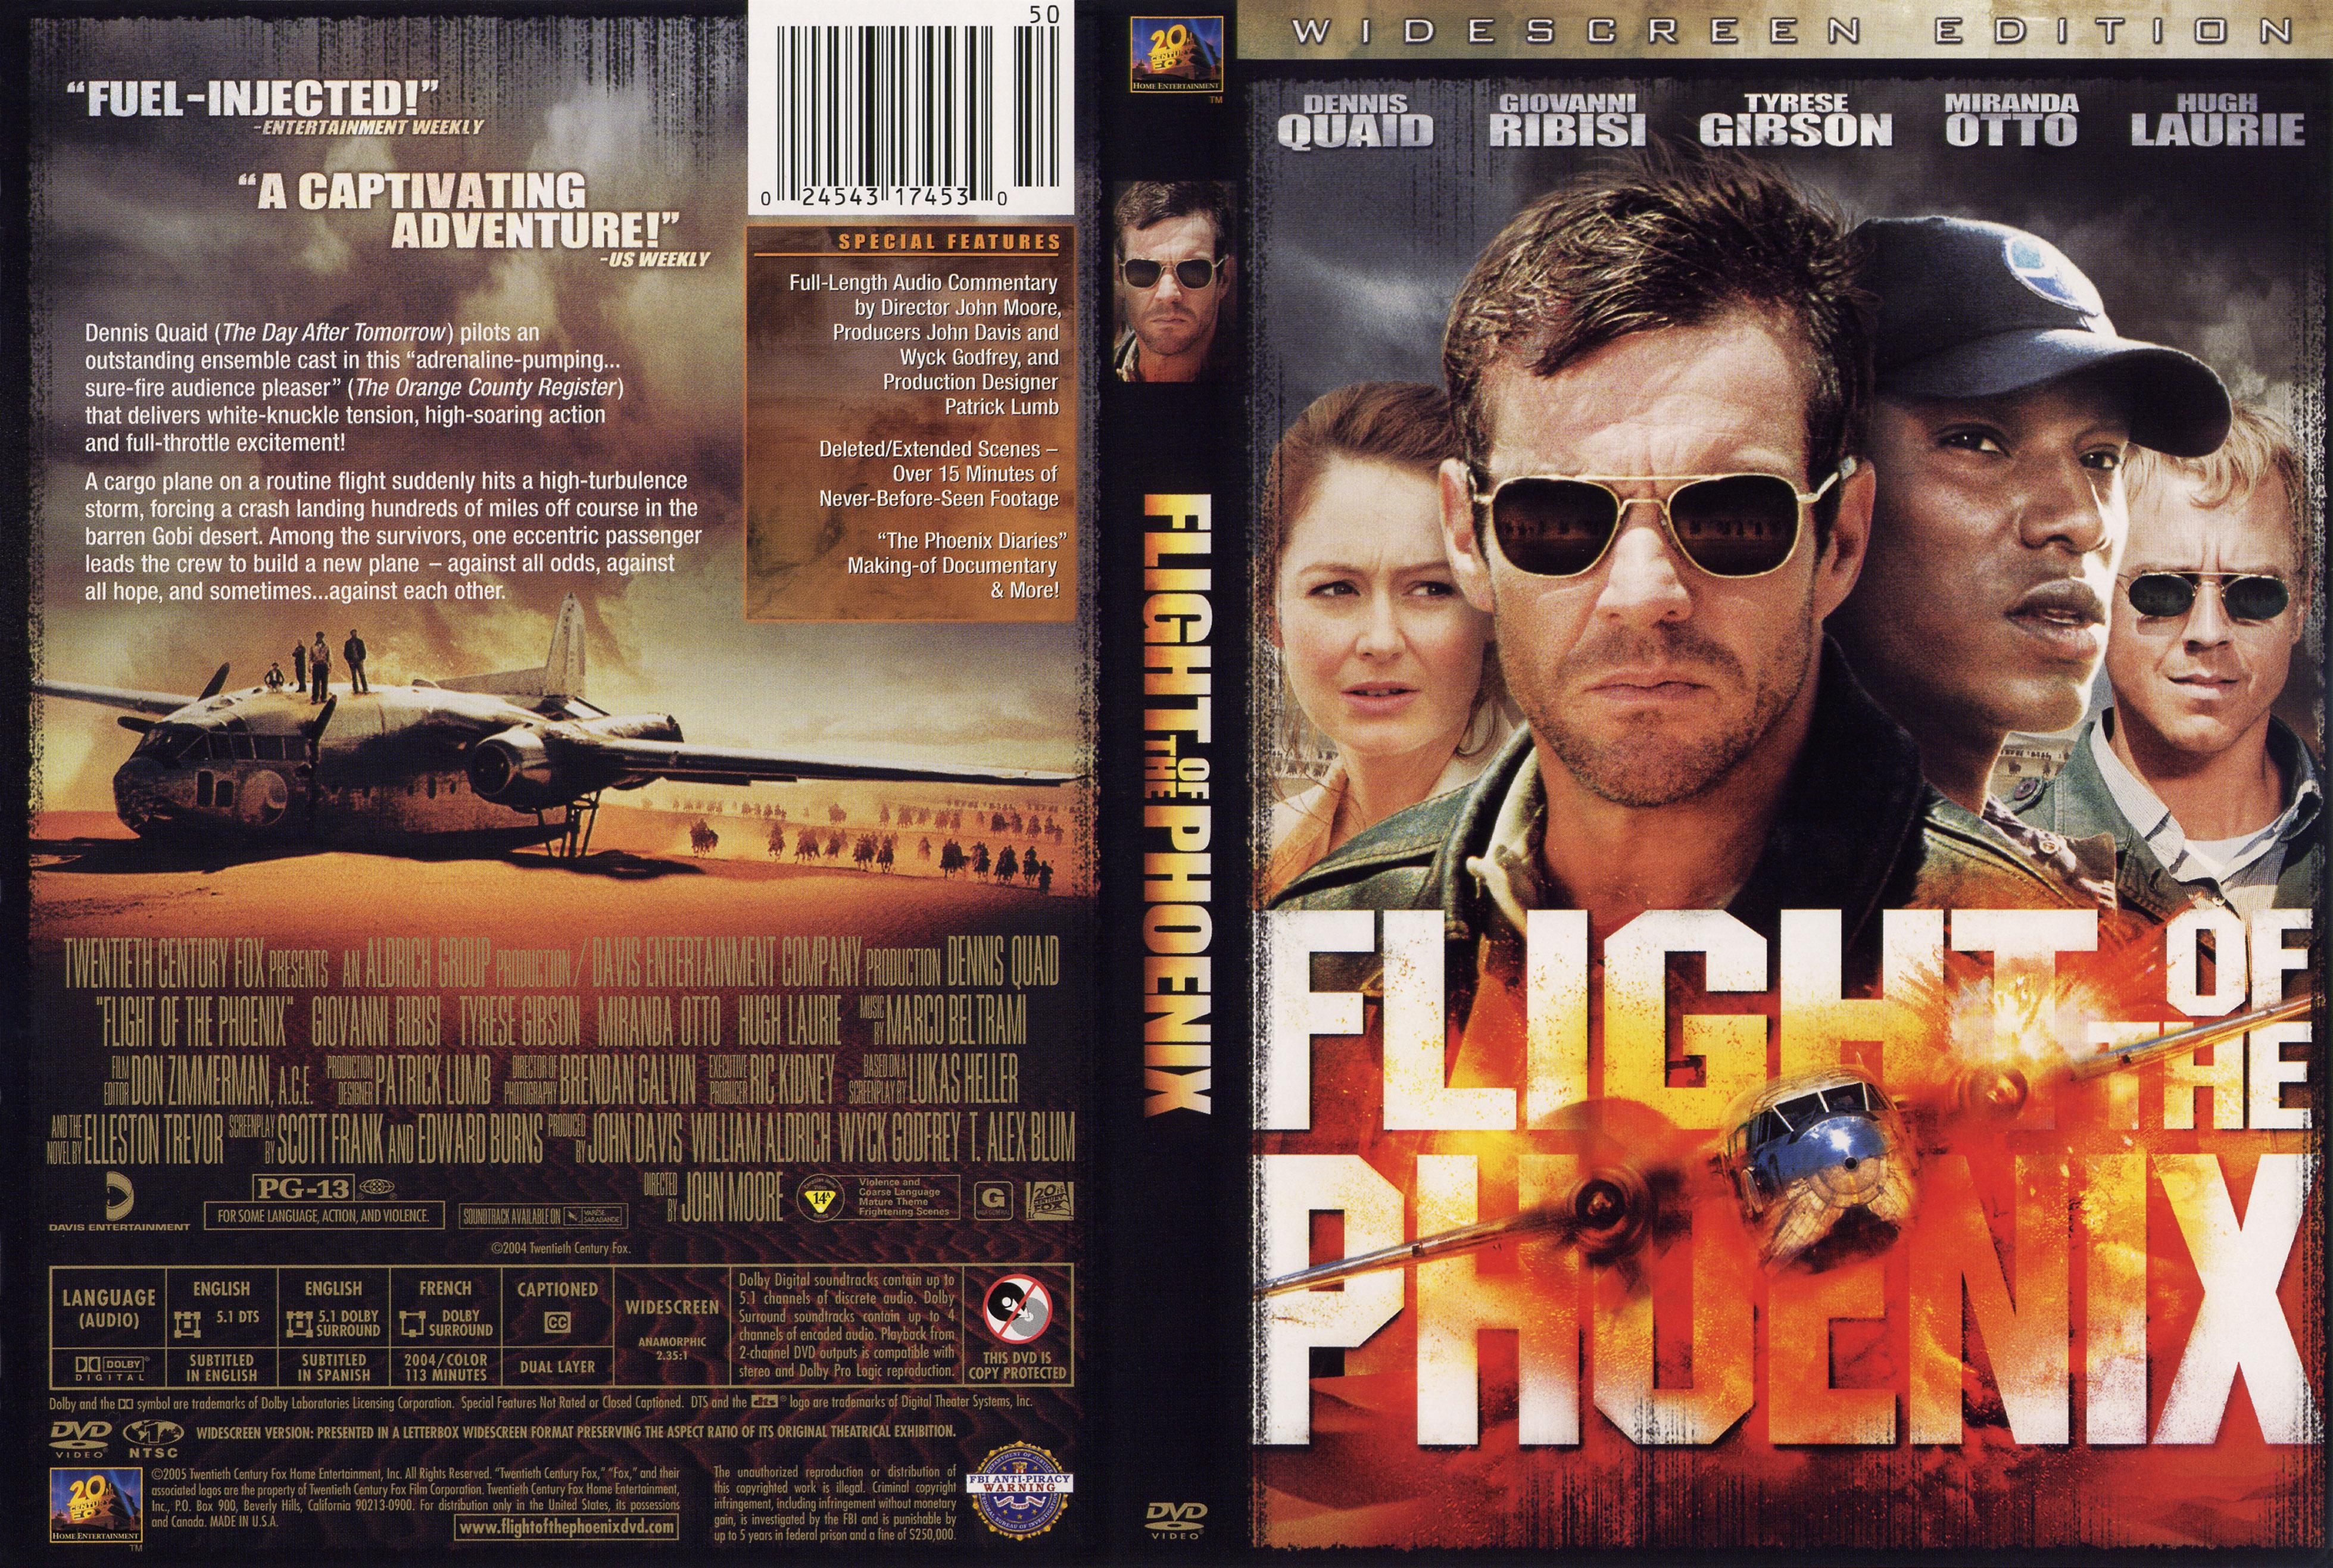 flight of the phoenix 2004 full movie free download